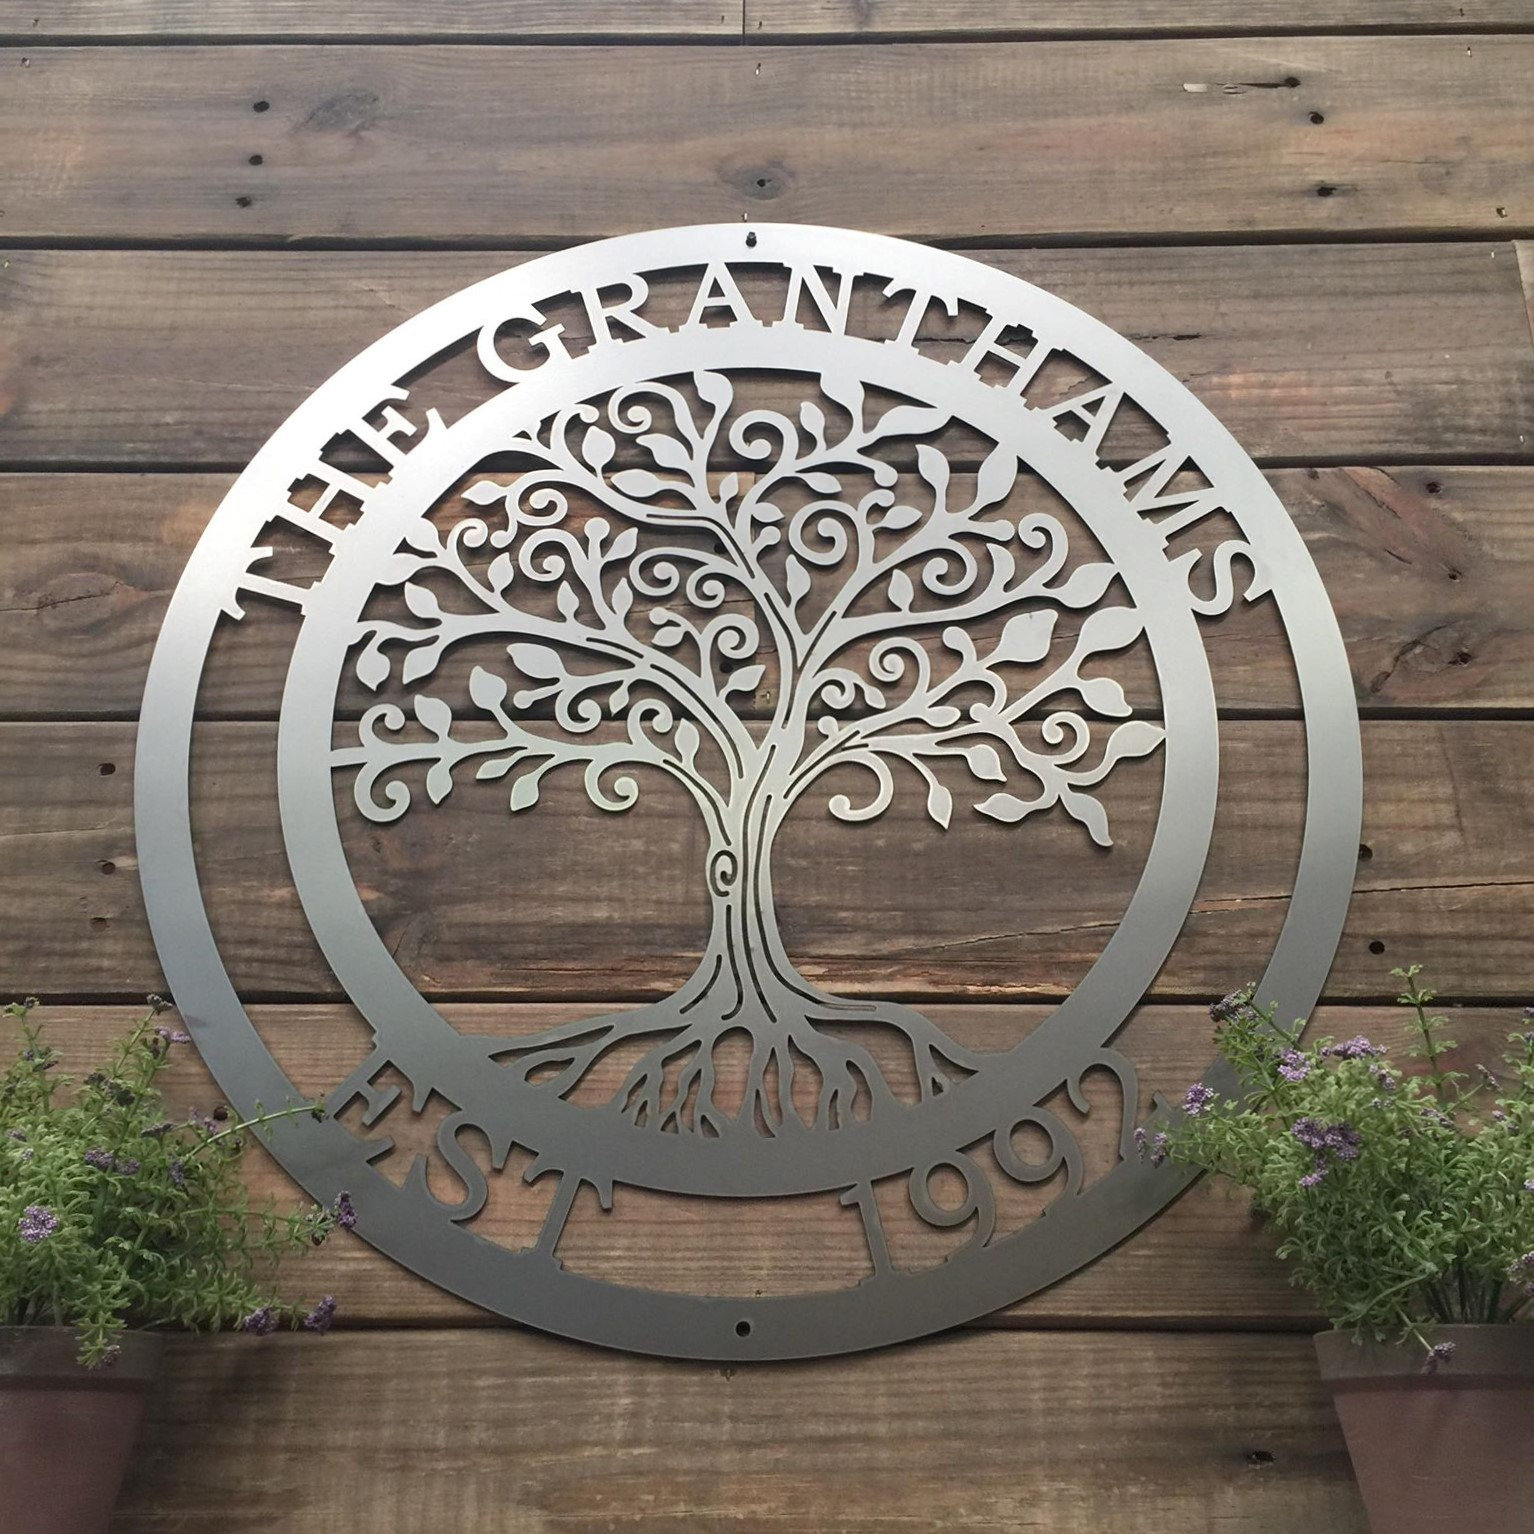 Olive/gray Metal Wall Decor Regarding Newest Loving Tree Of Life Wall Art (View 12 of 20)